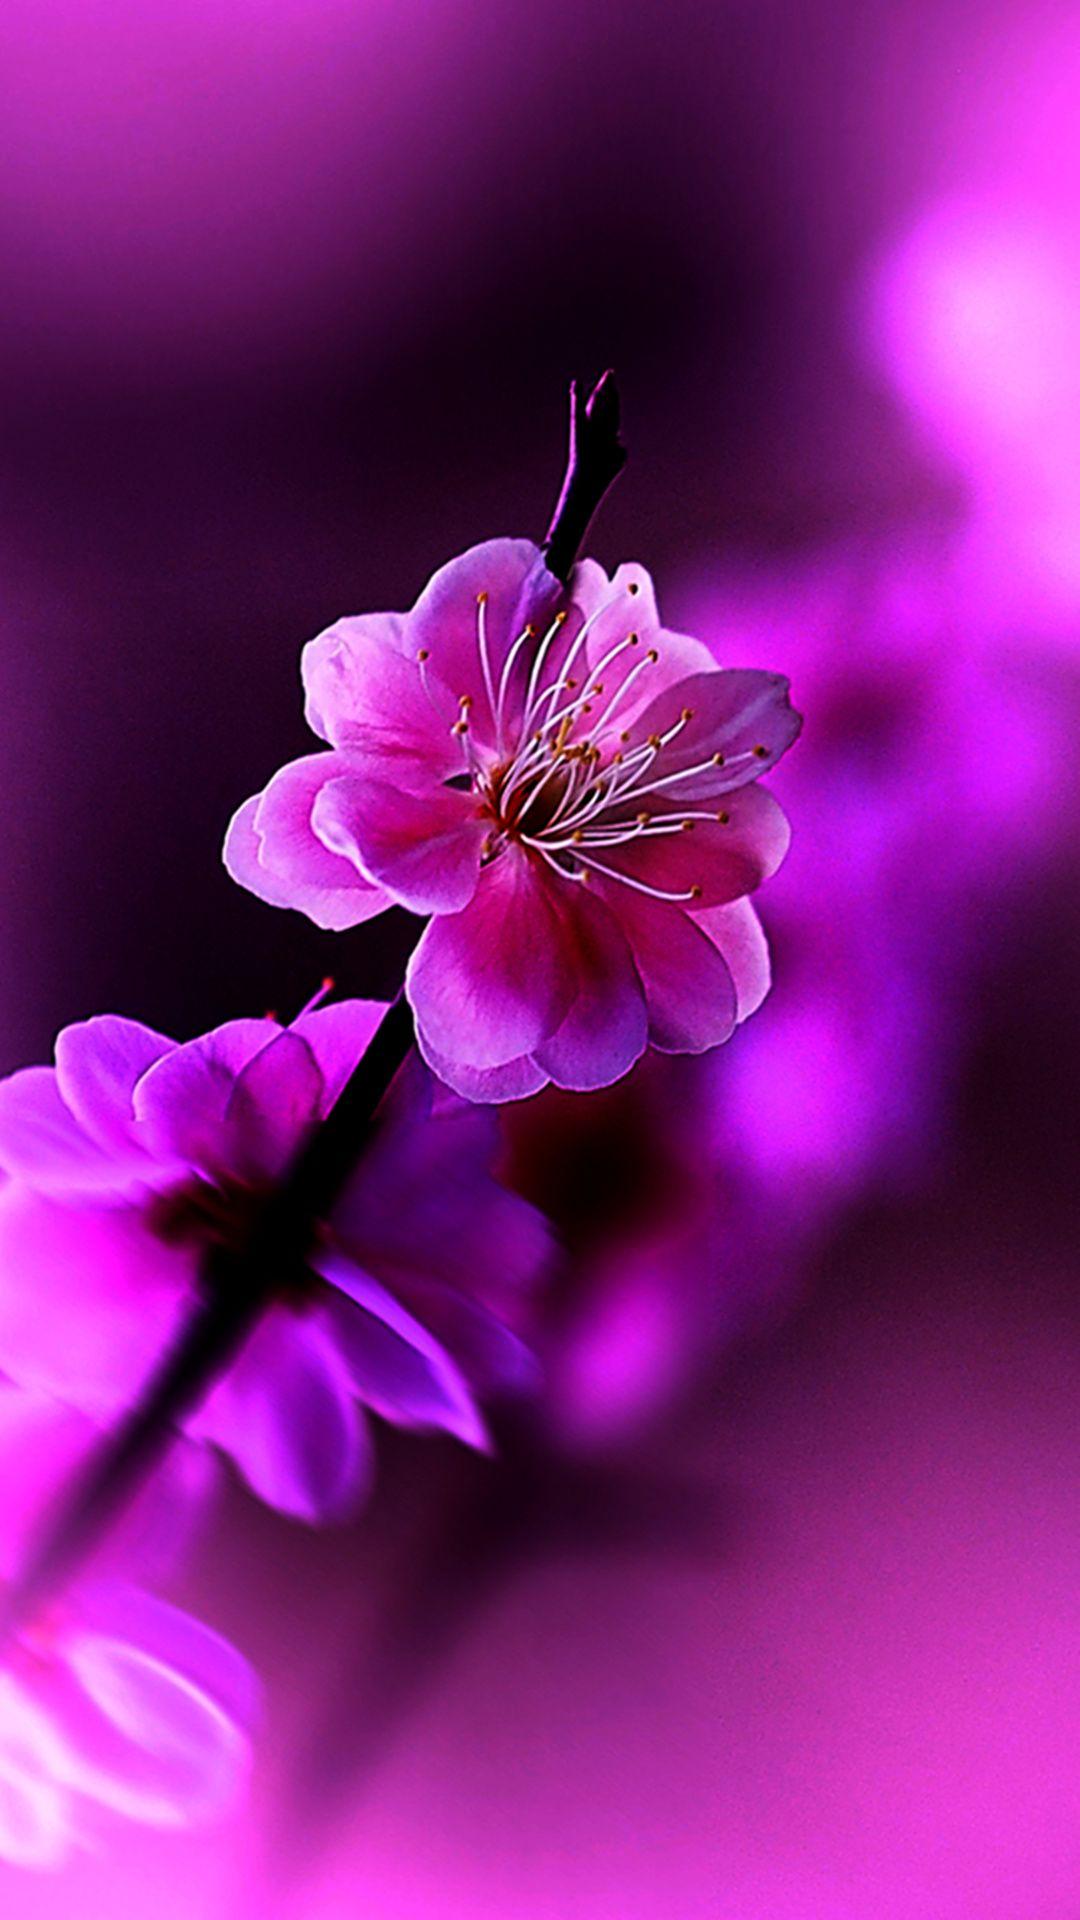 Http Www Vactualpapers Com Gallery Spring Flowers Mobile Hd Wallpaper 3 Hd Flower Wallpaper Iphone Spring Wallpaper Beautiful Flowers Wallpapers